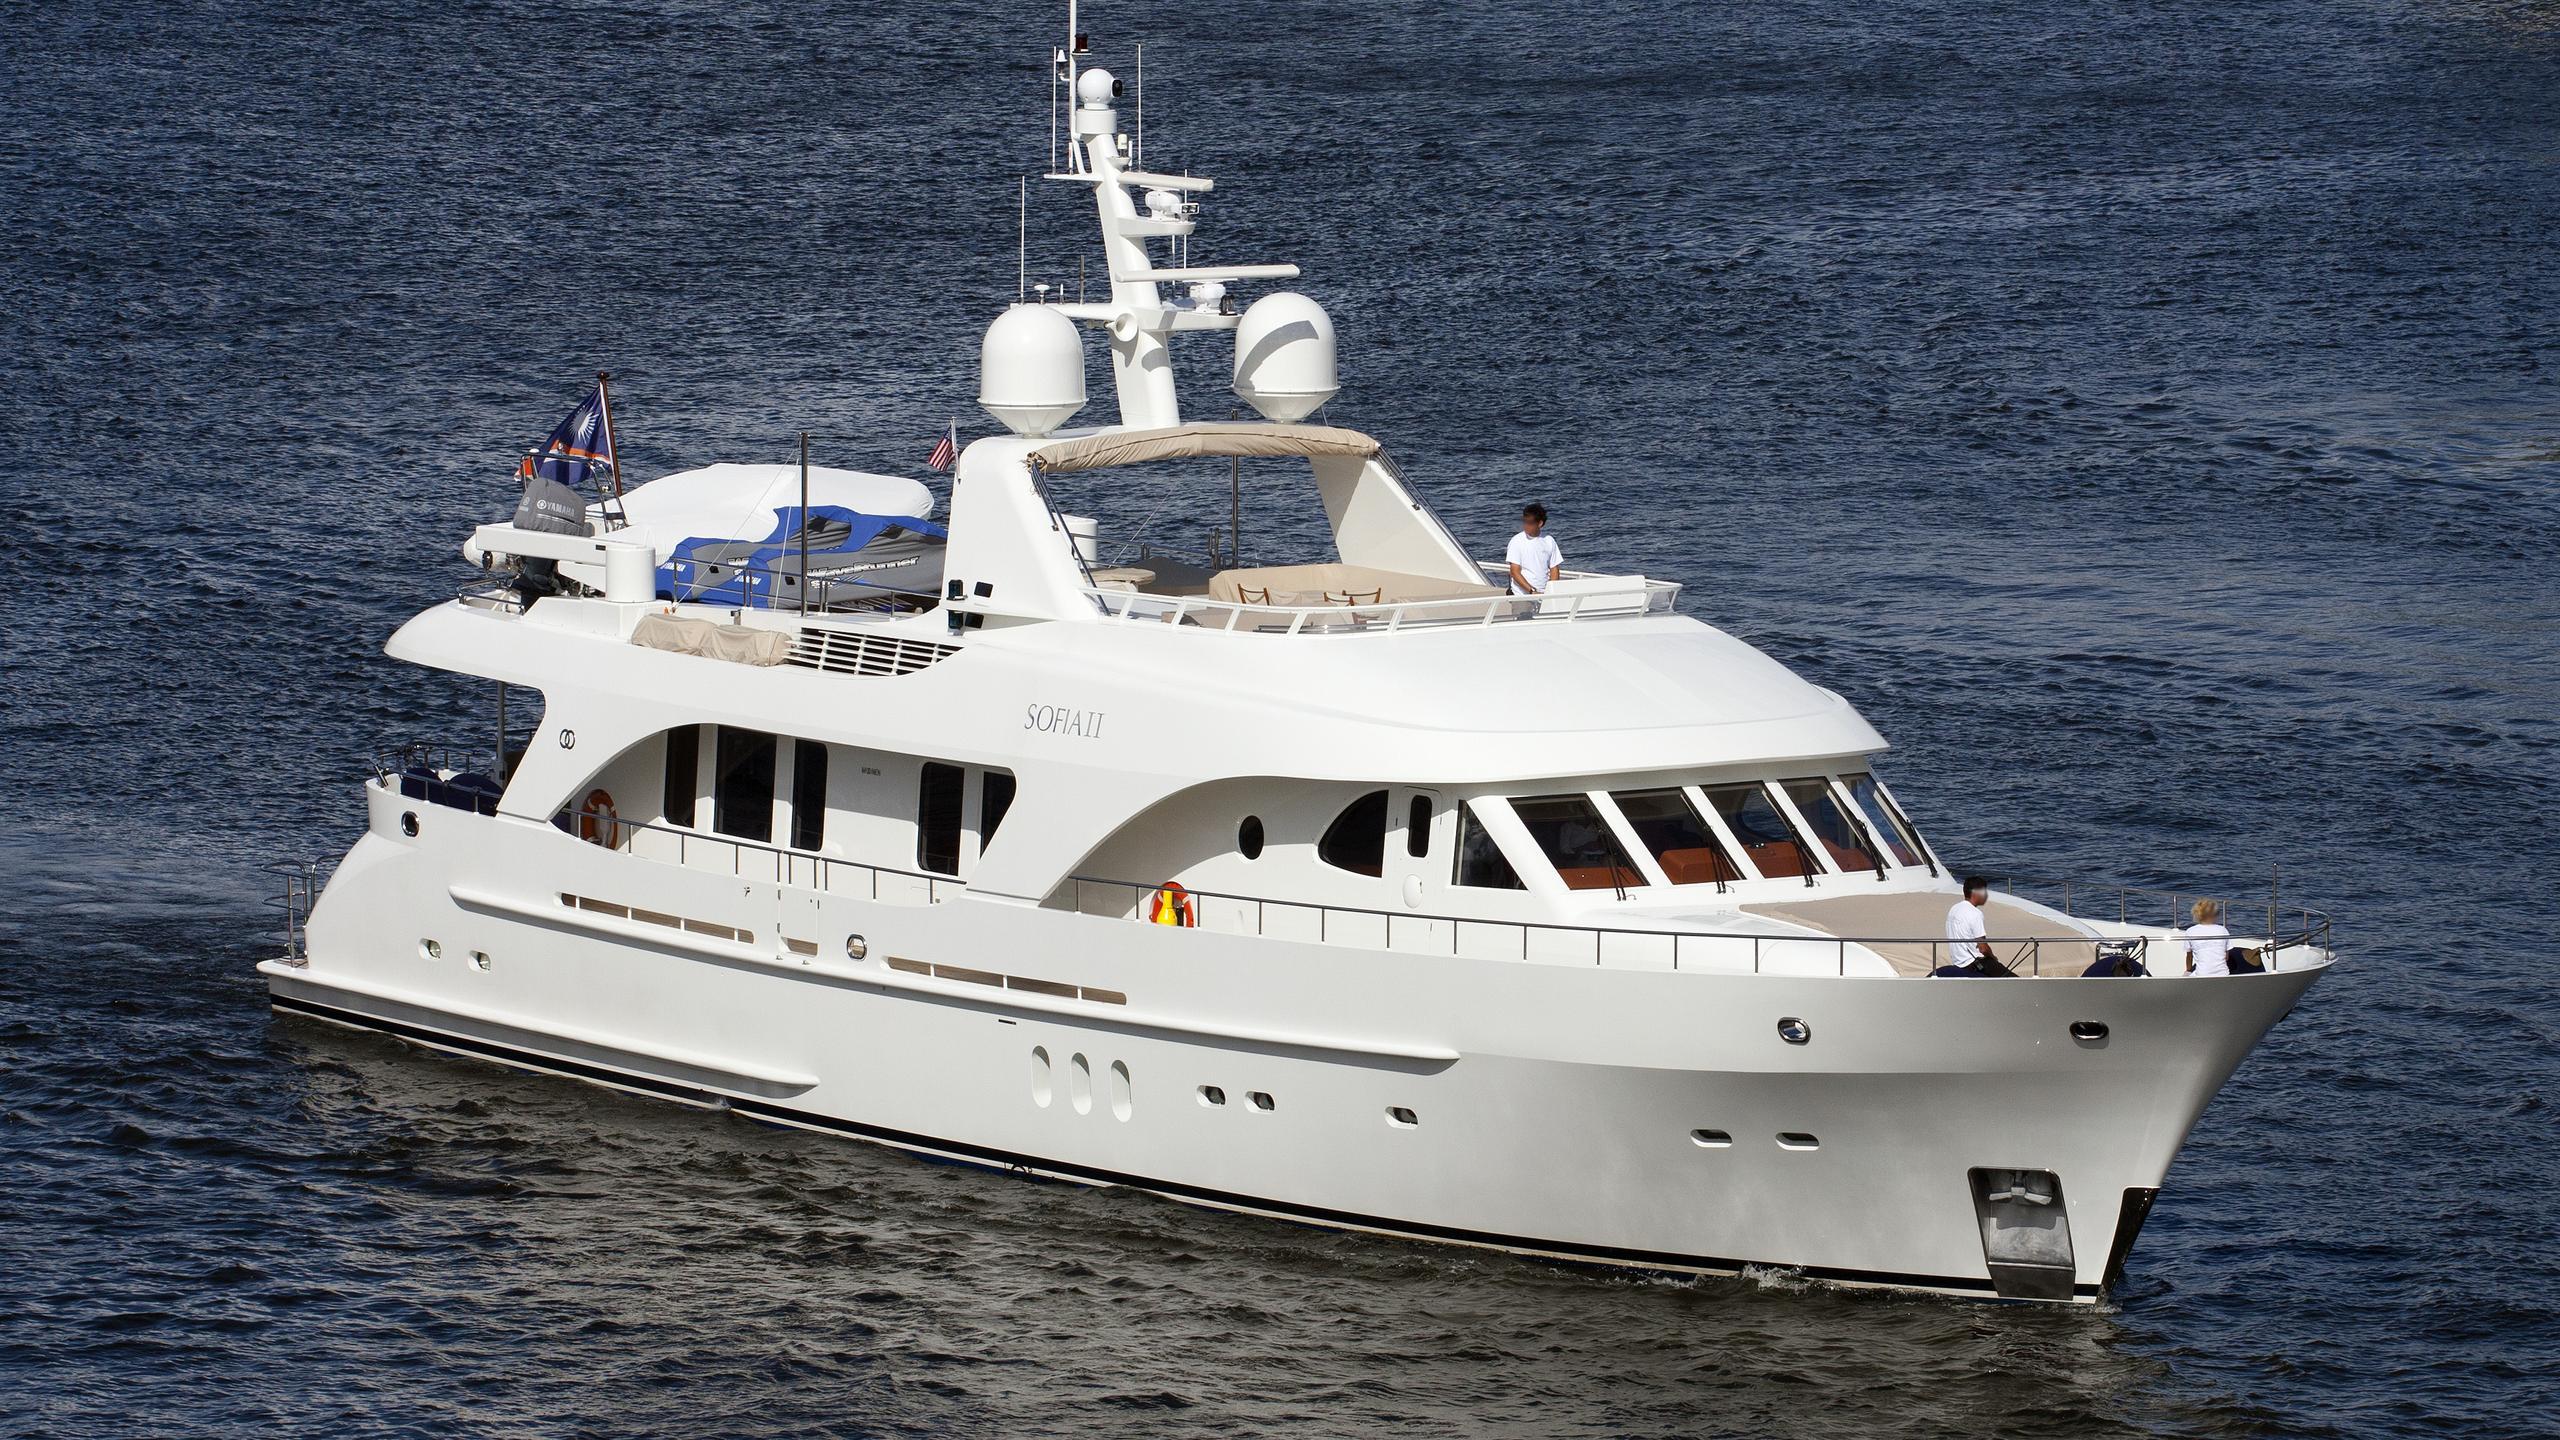 sofia-ii-yacht-exterior